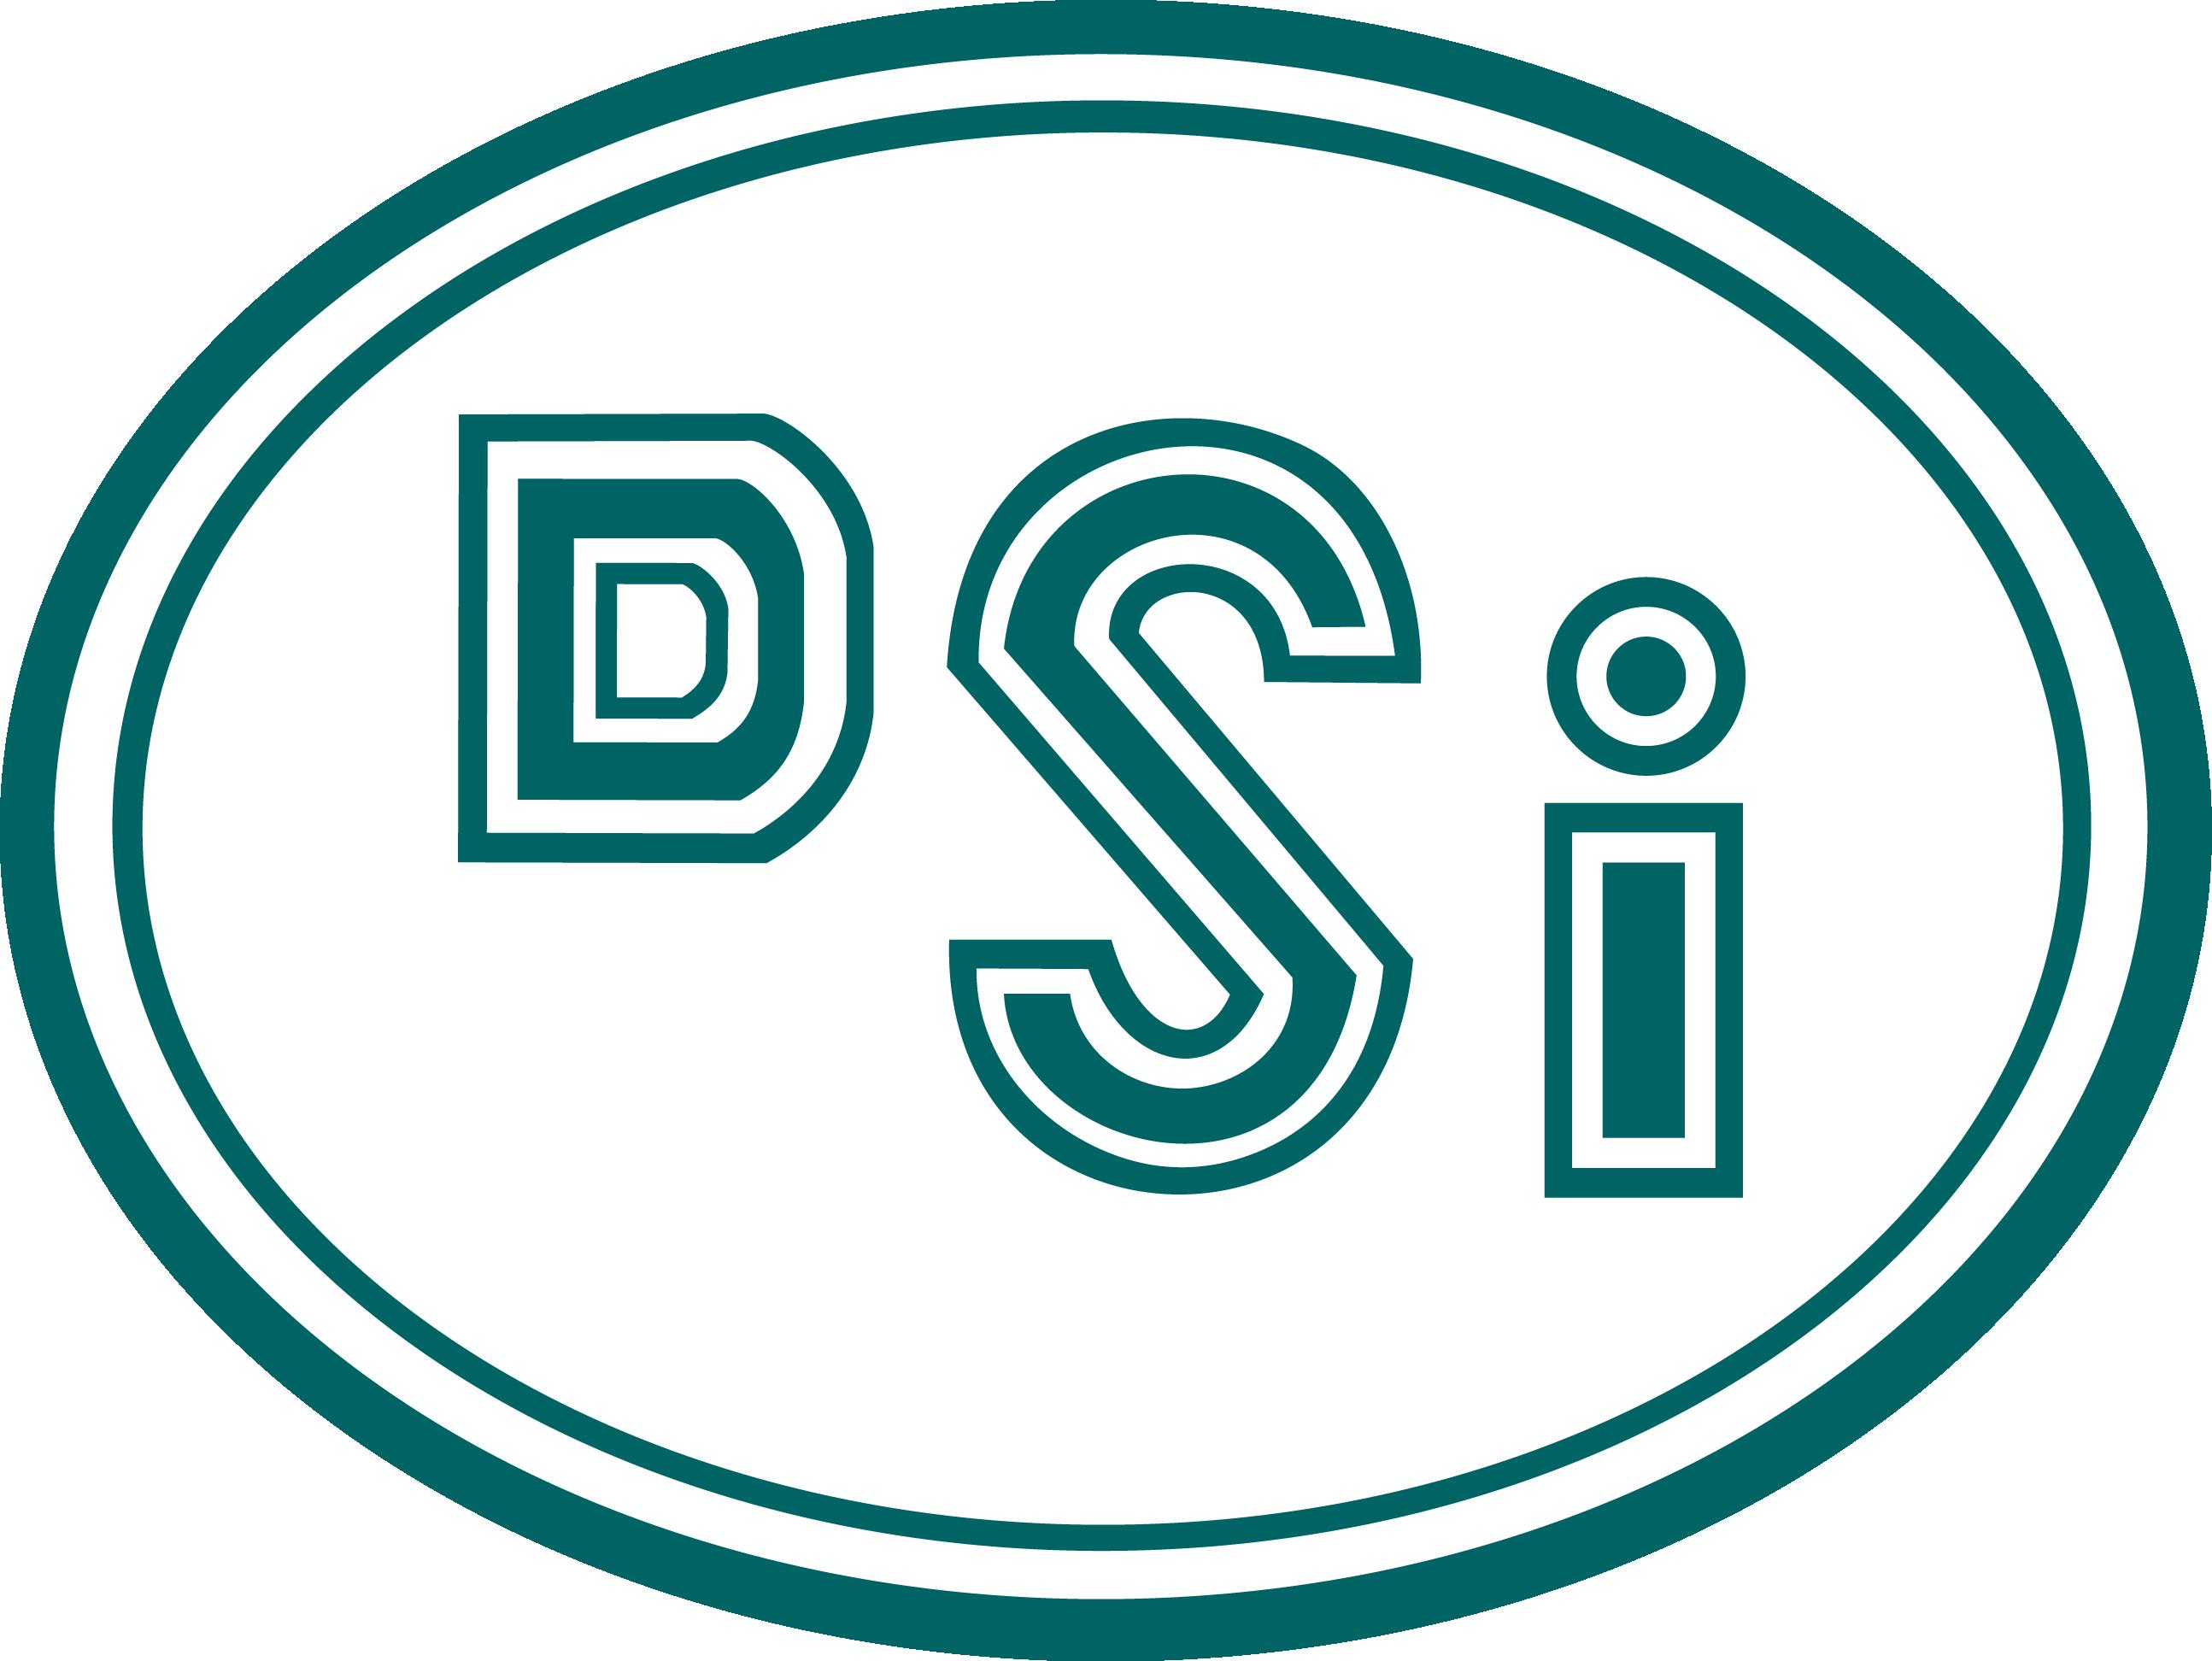 dsi_logo-dsi_logo-14